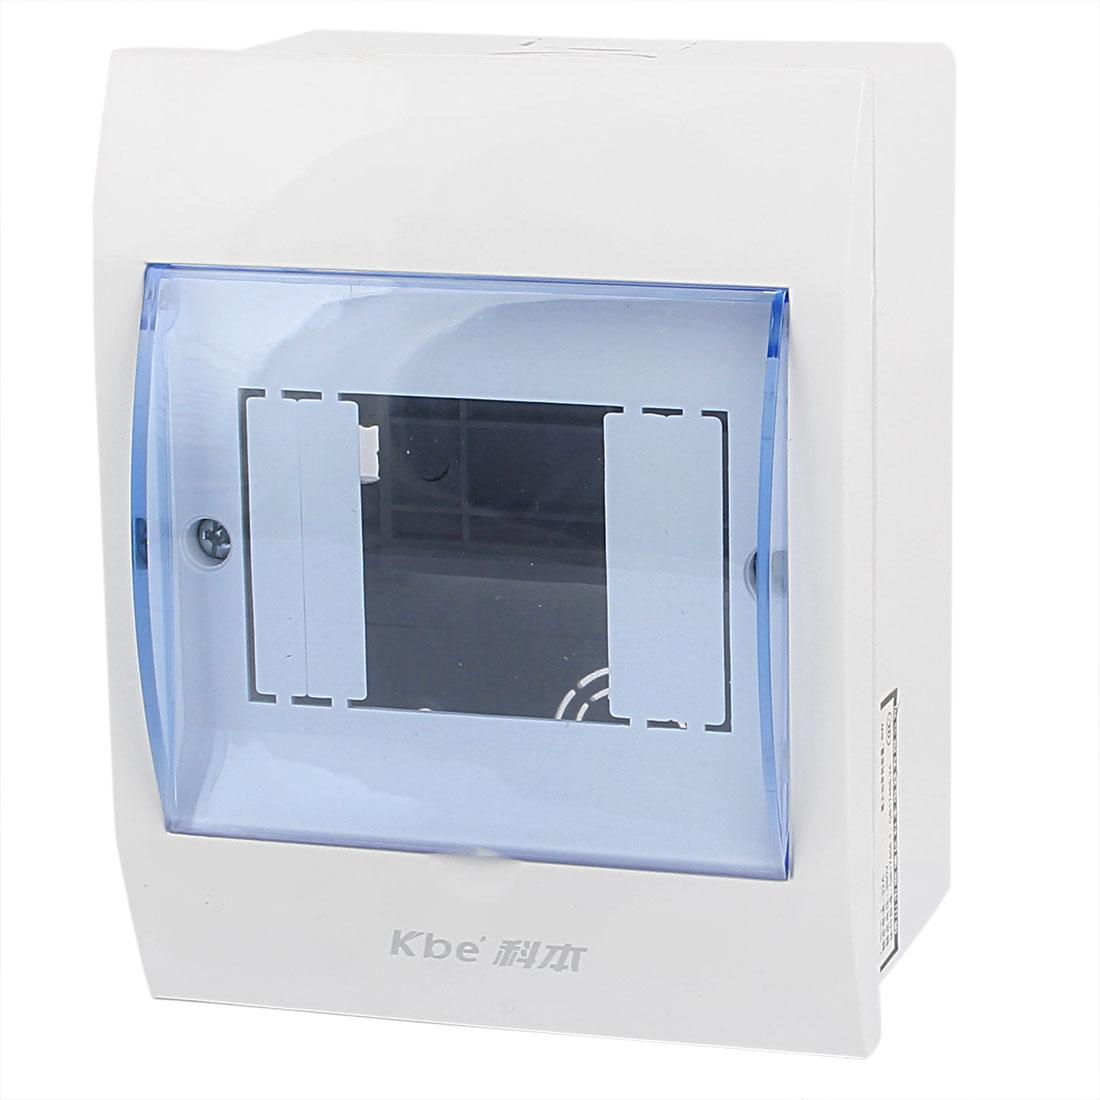 Clear Blue Fllip Cap 2-4 Rectangular Way Power Supply Distribution Box